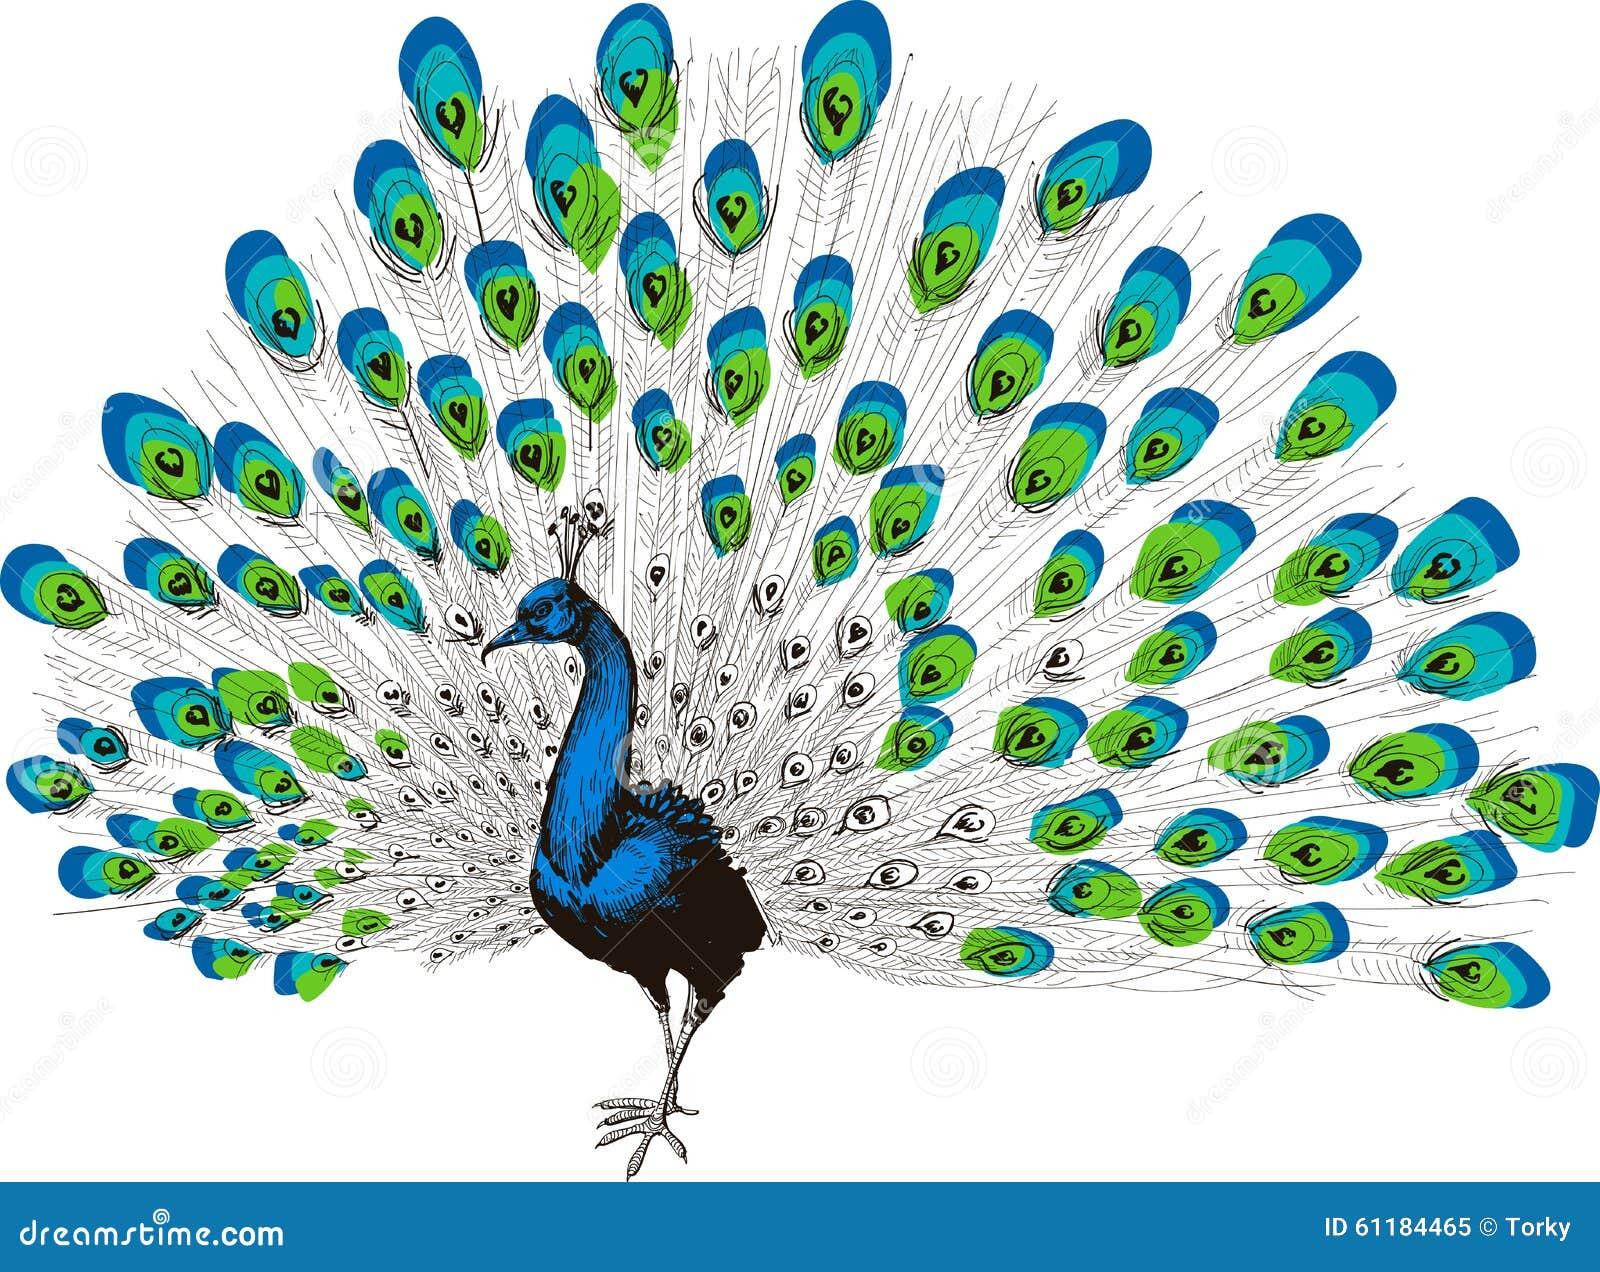 Moderno Pavo Uñas Diseños Inspiración - Ideas de Pintar de Uñas ...